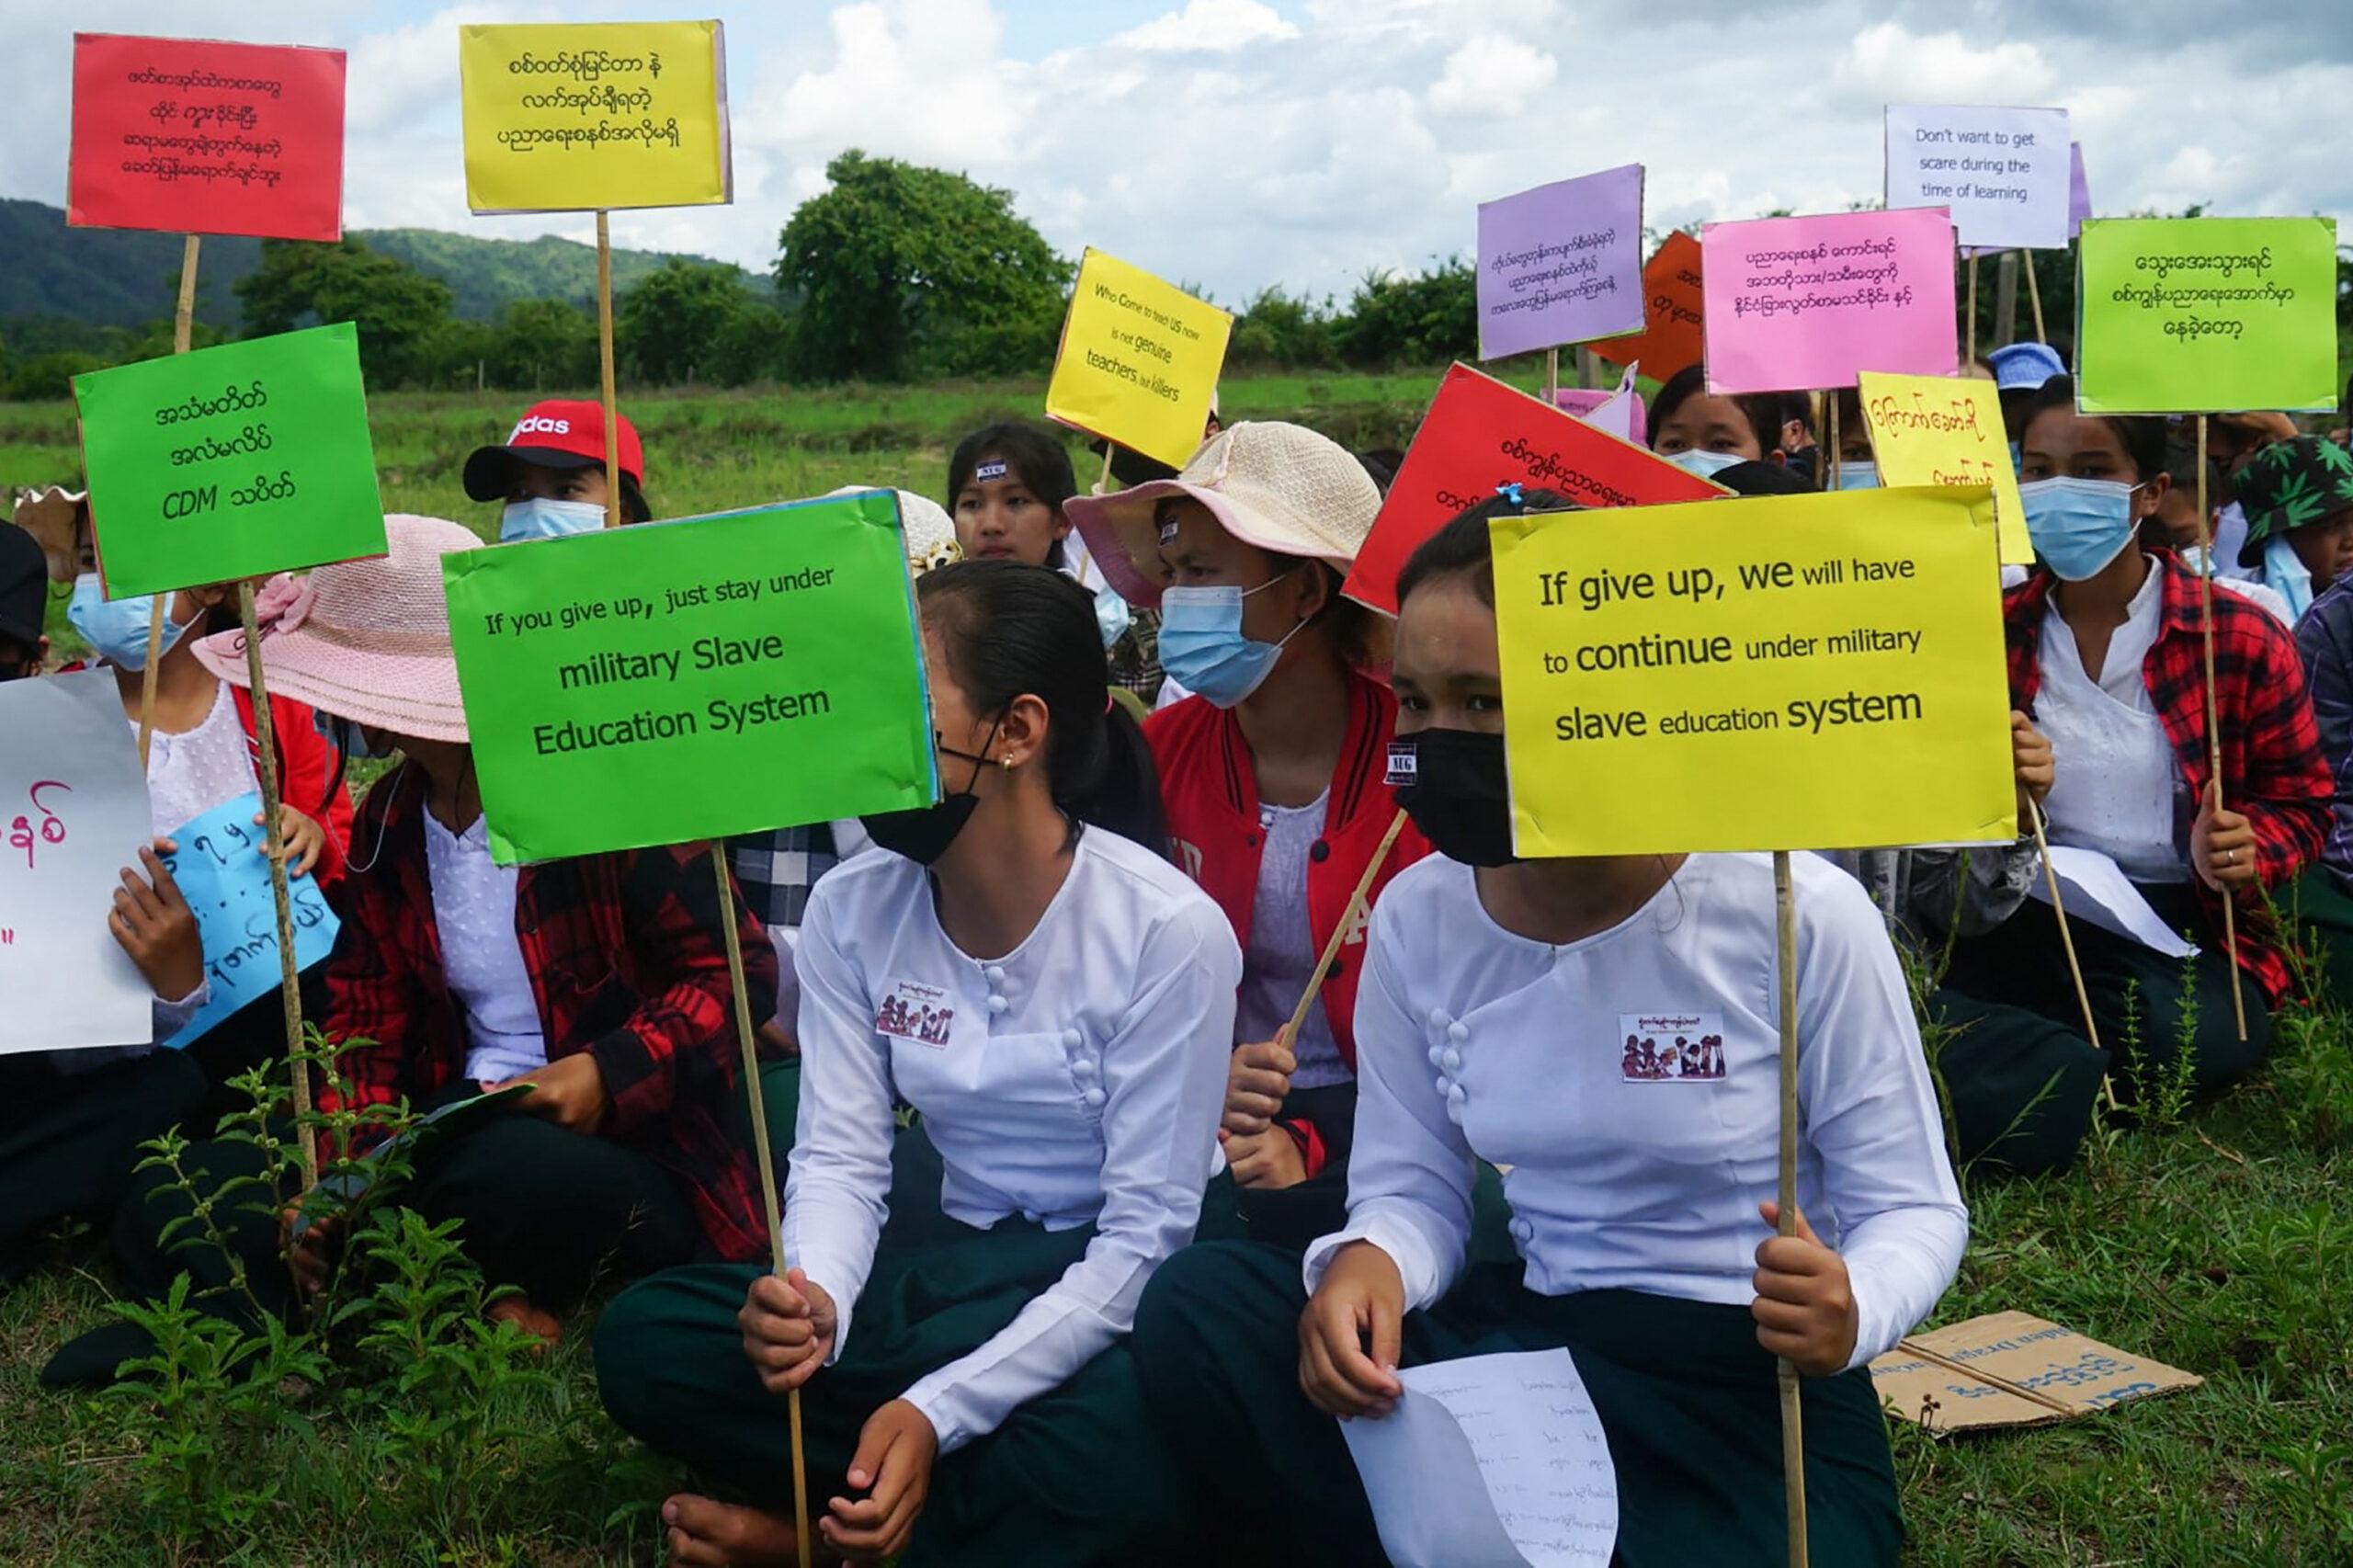 School's out for Myanmar students defying junta threats